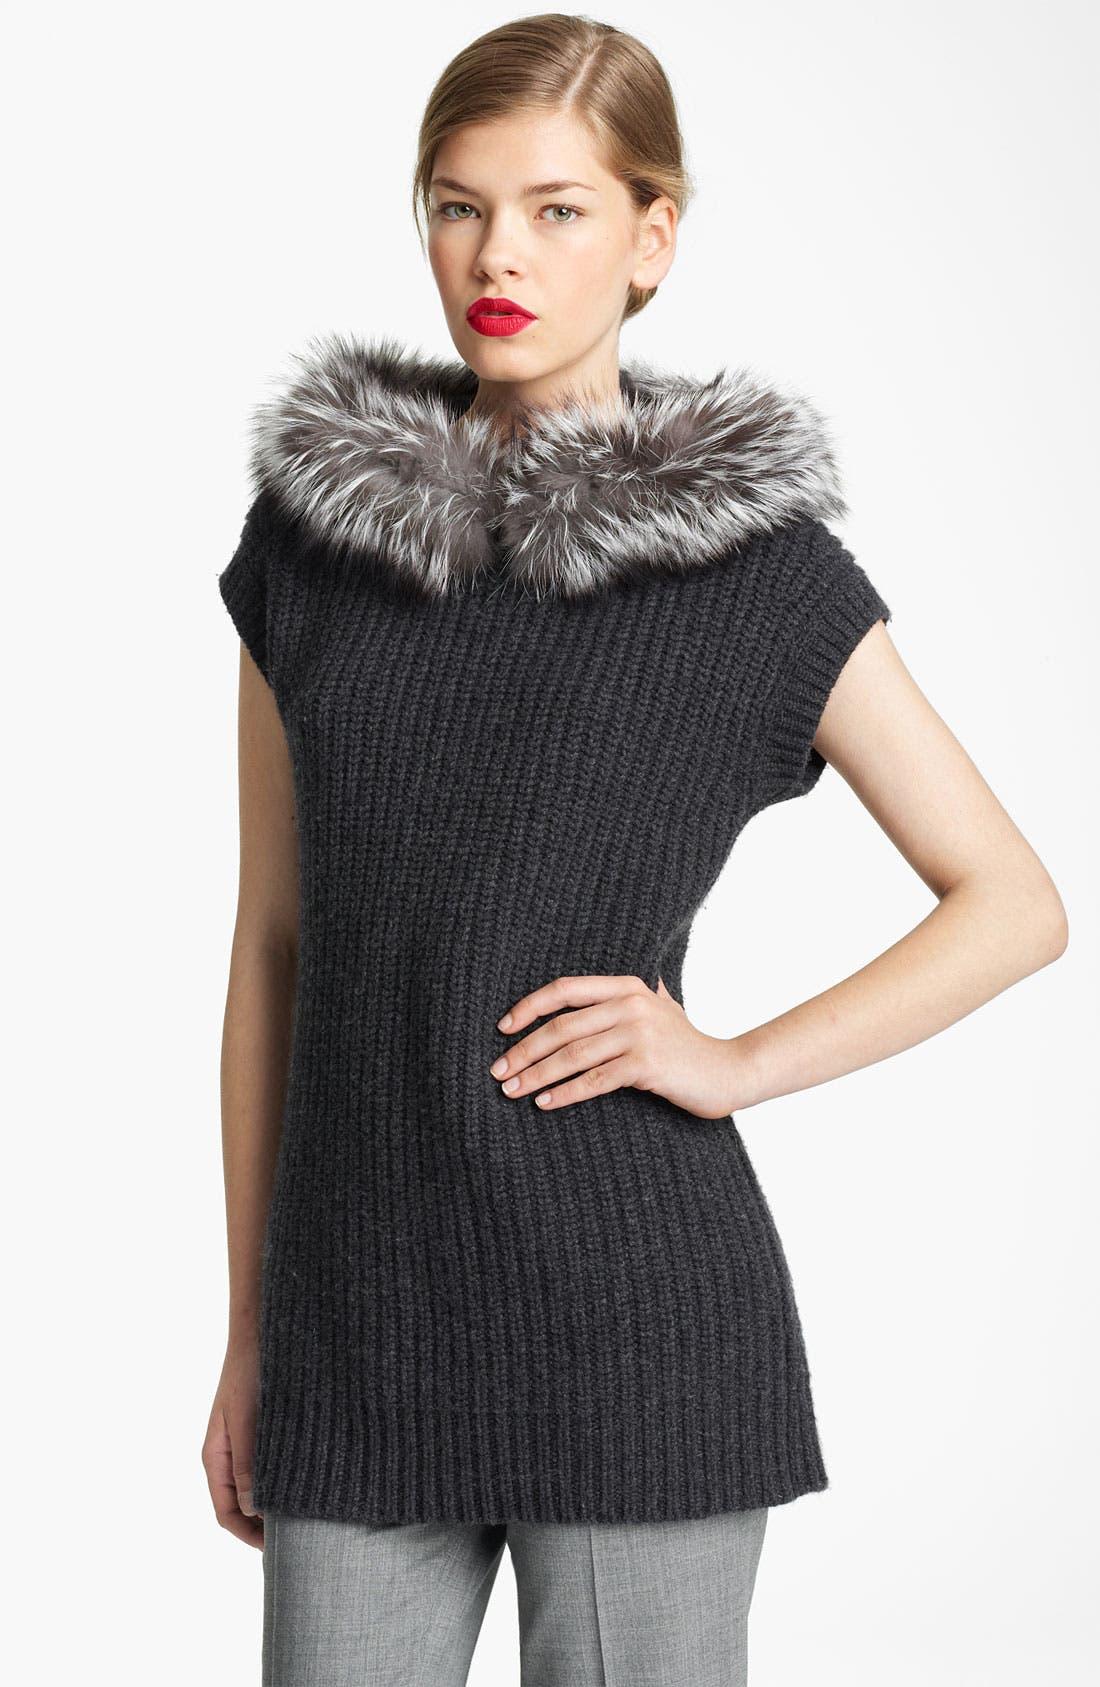 Main Image - Michael Kors Genuine Fox Fur Trim Hooded Sweater